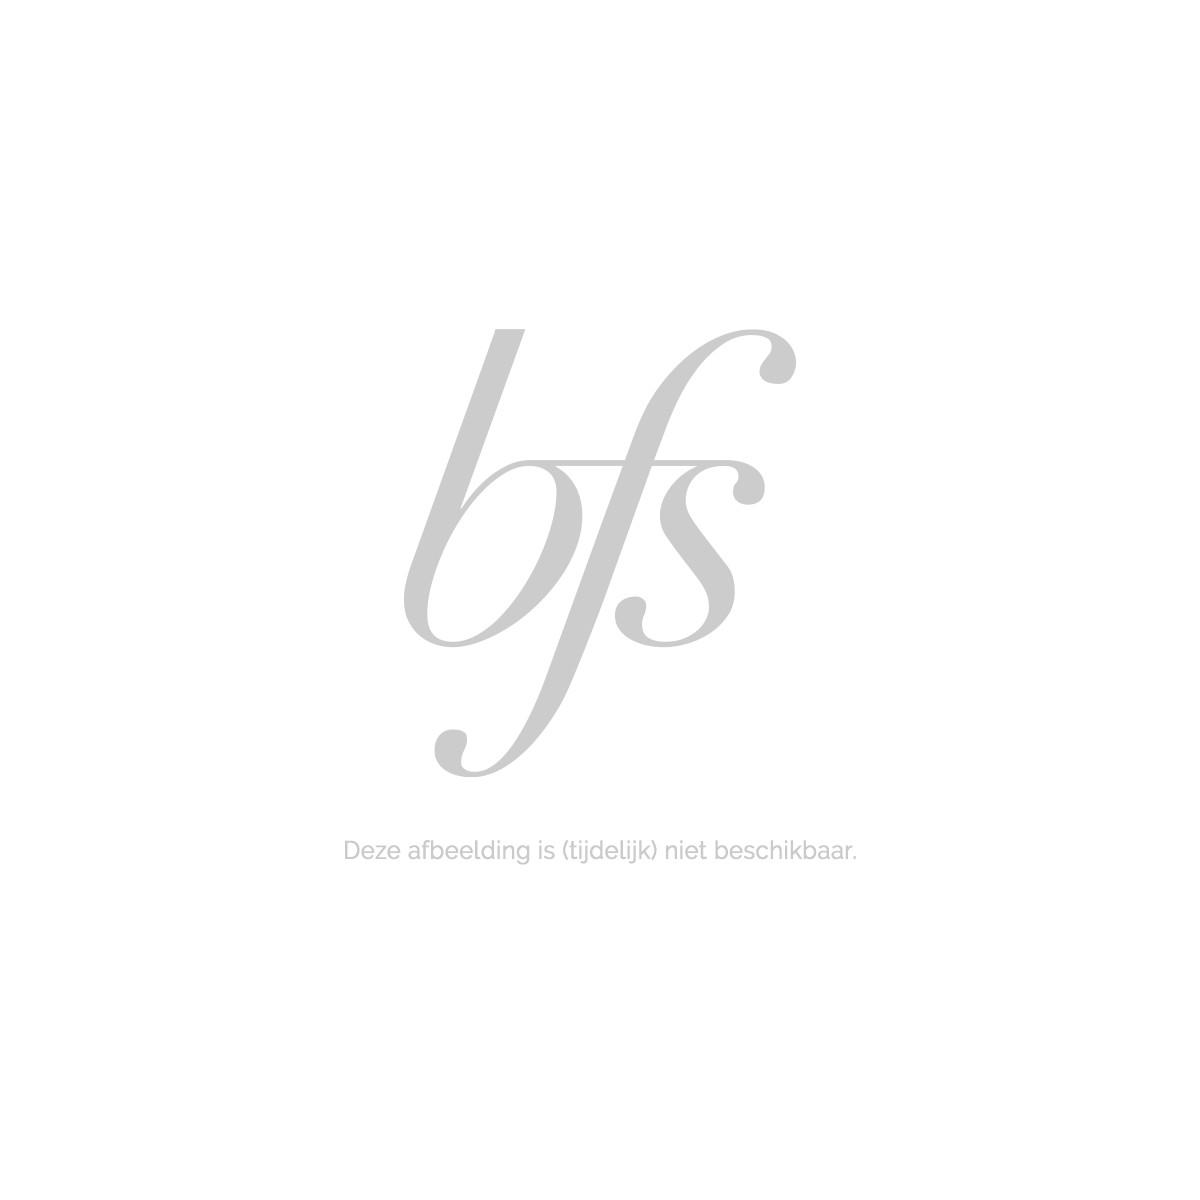 Malu Wilz Bronzing Powder Cream Toffee/ Hazelnut Brown